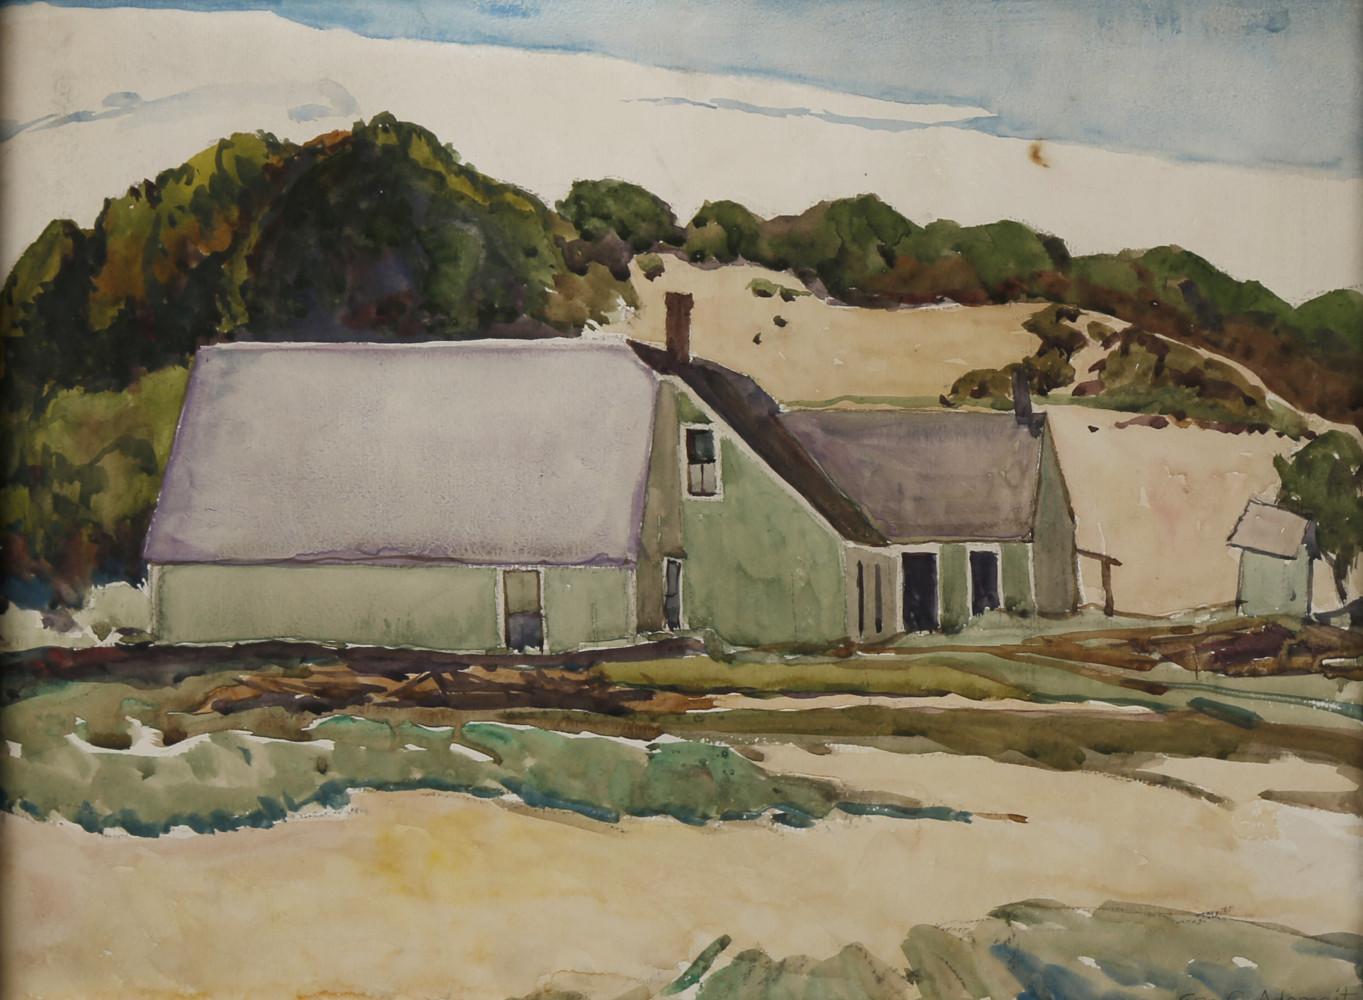 Barns in Rural Landscape by George Gustav Adomeit